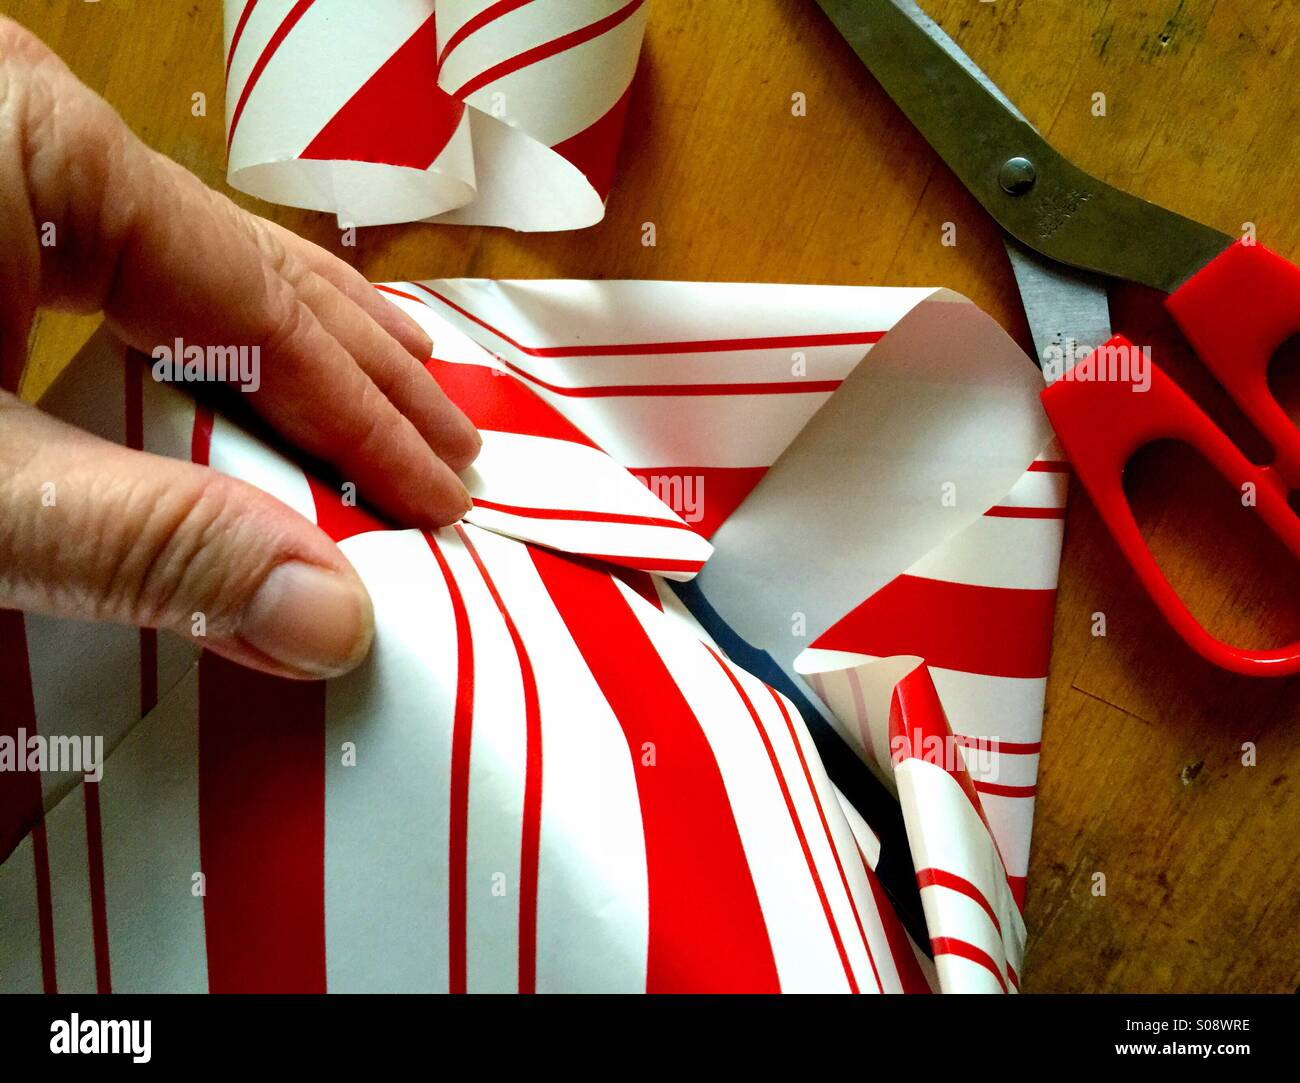 Wrapping Christmas present - Stock Image